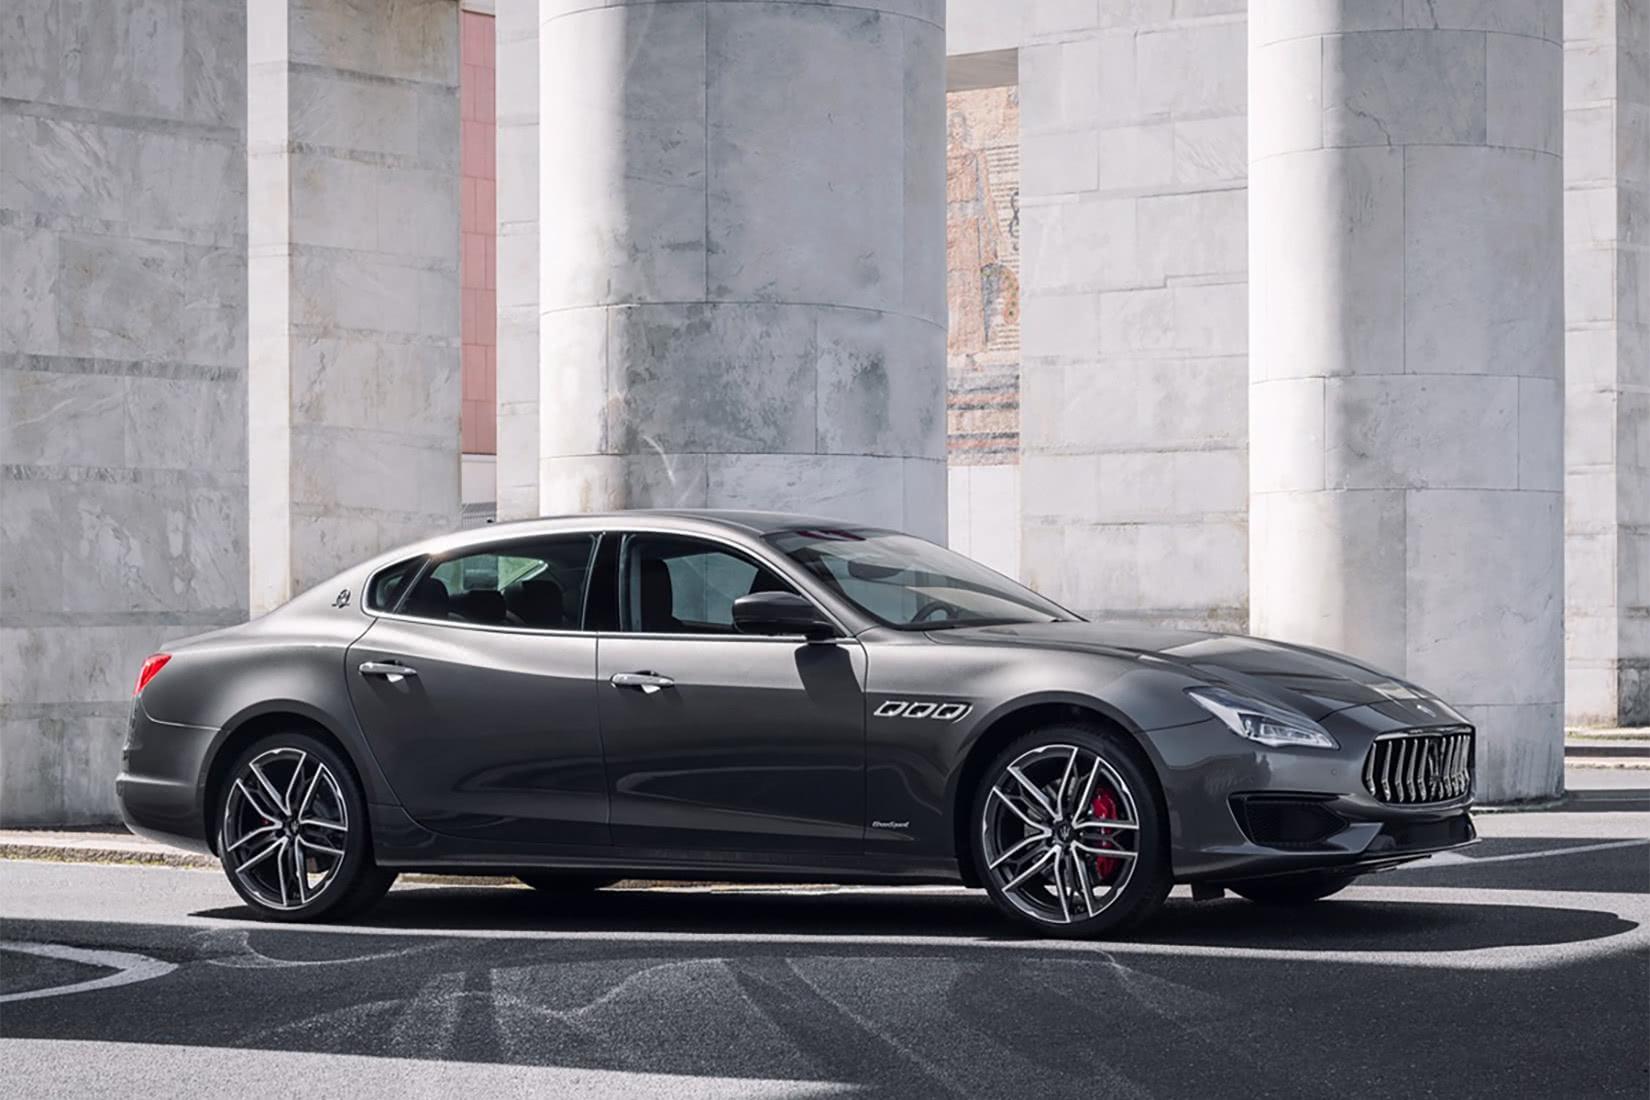 best luxury car brand Maserati - Luxe Digital